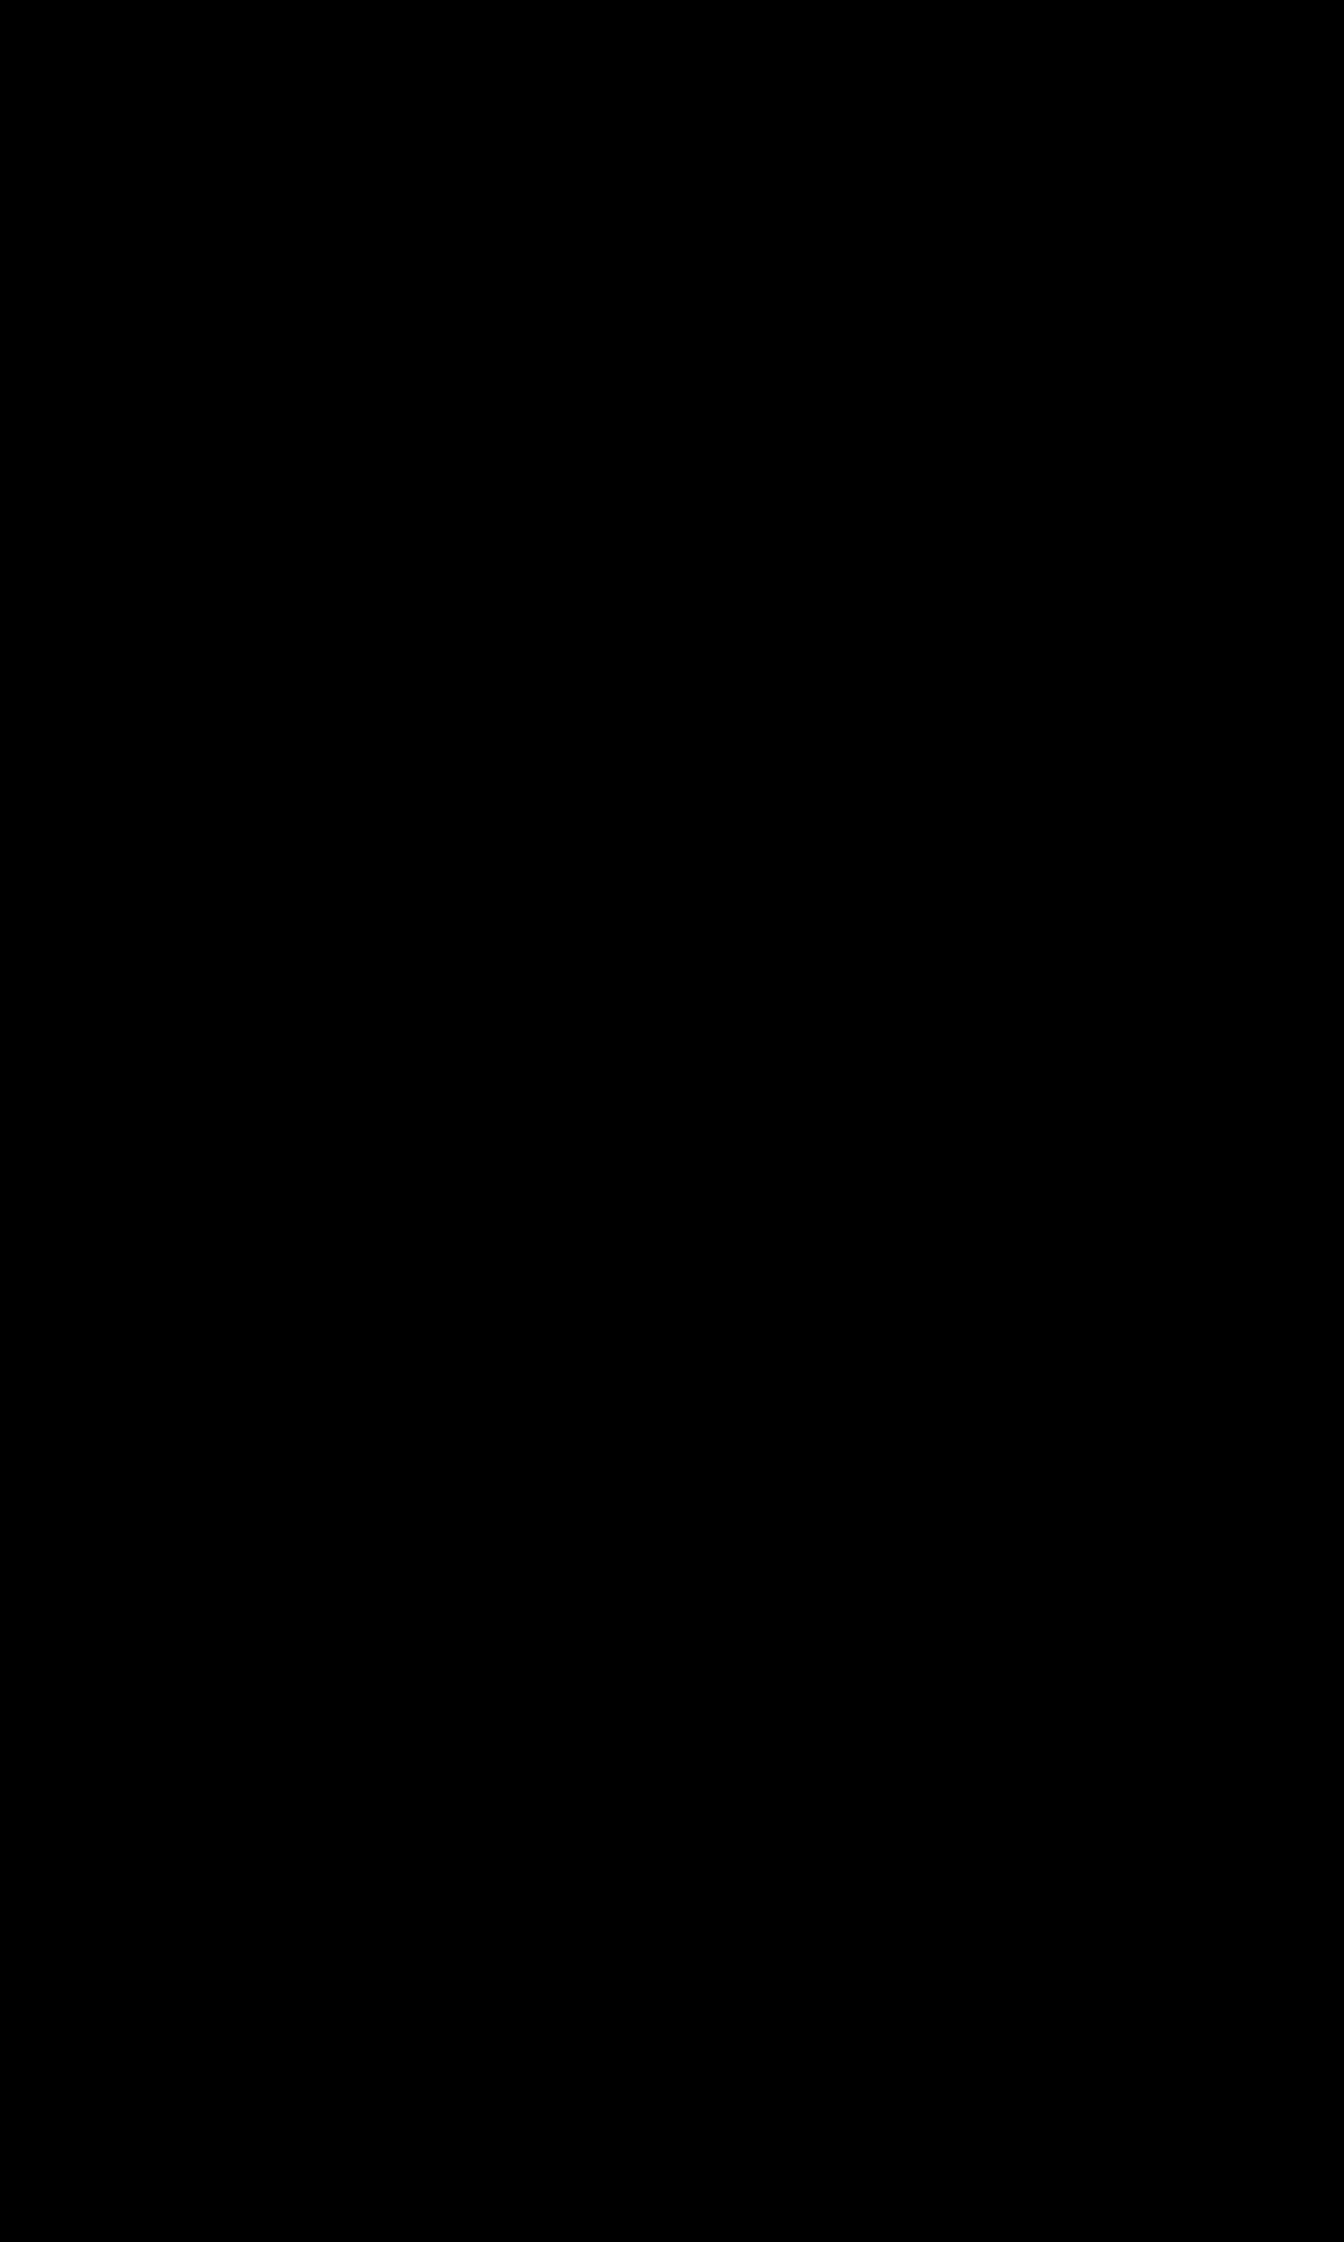 lamp clipart silhouette